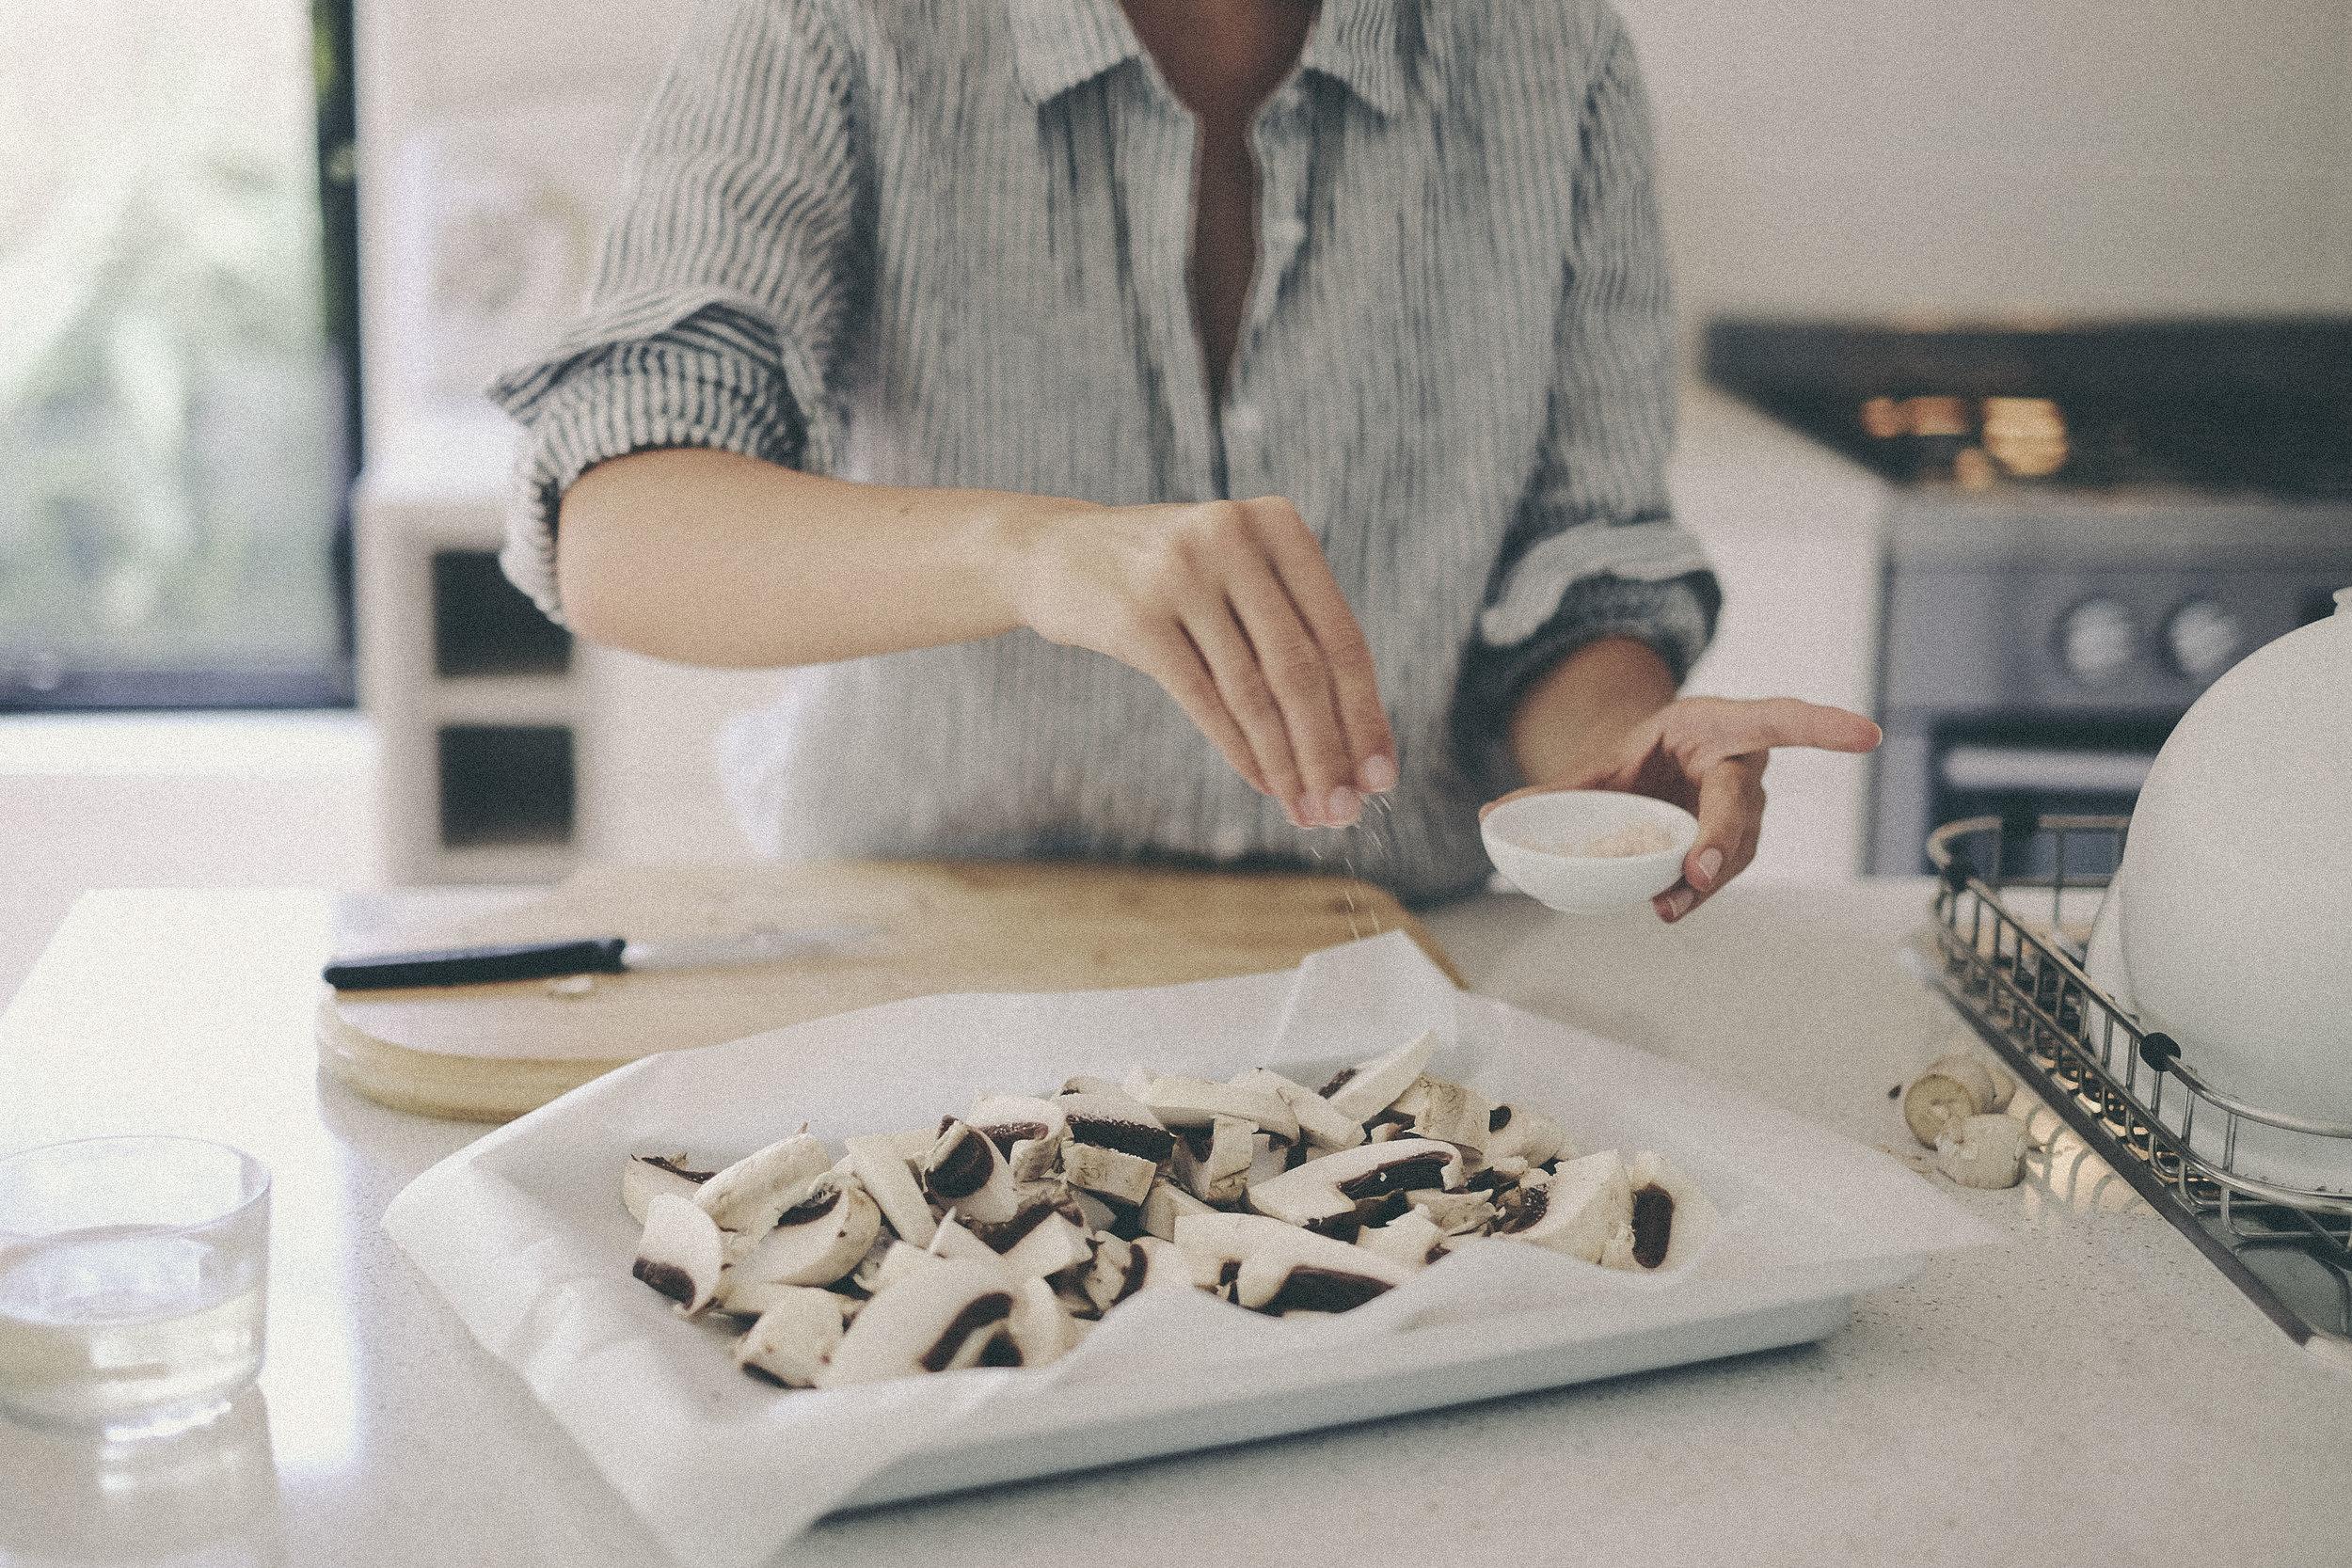 dérrive recipe - roasted mushroom, leek and thyme risotto